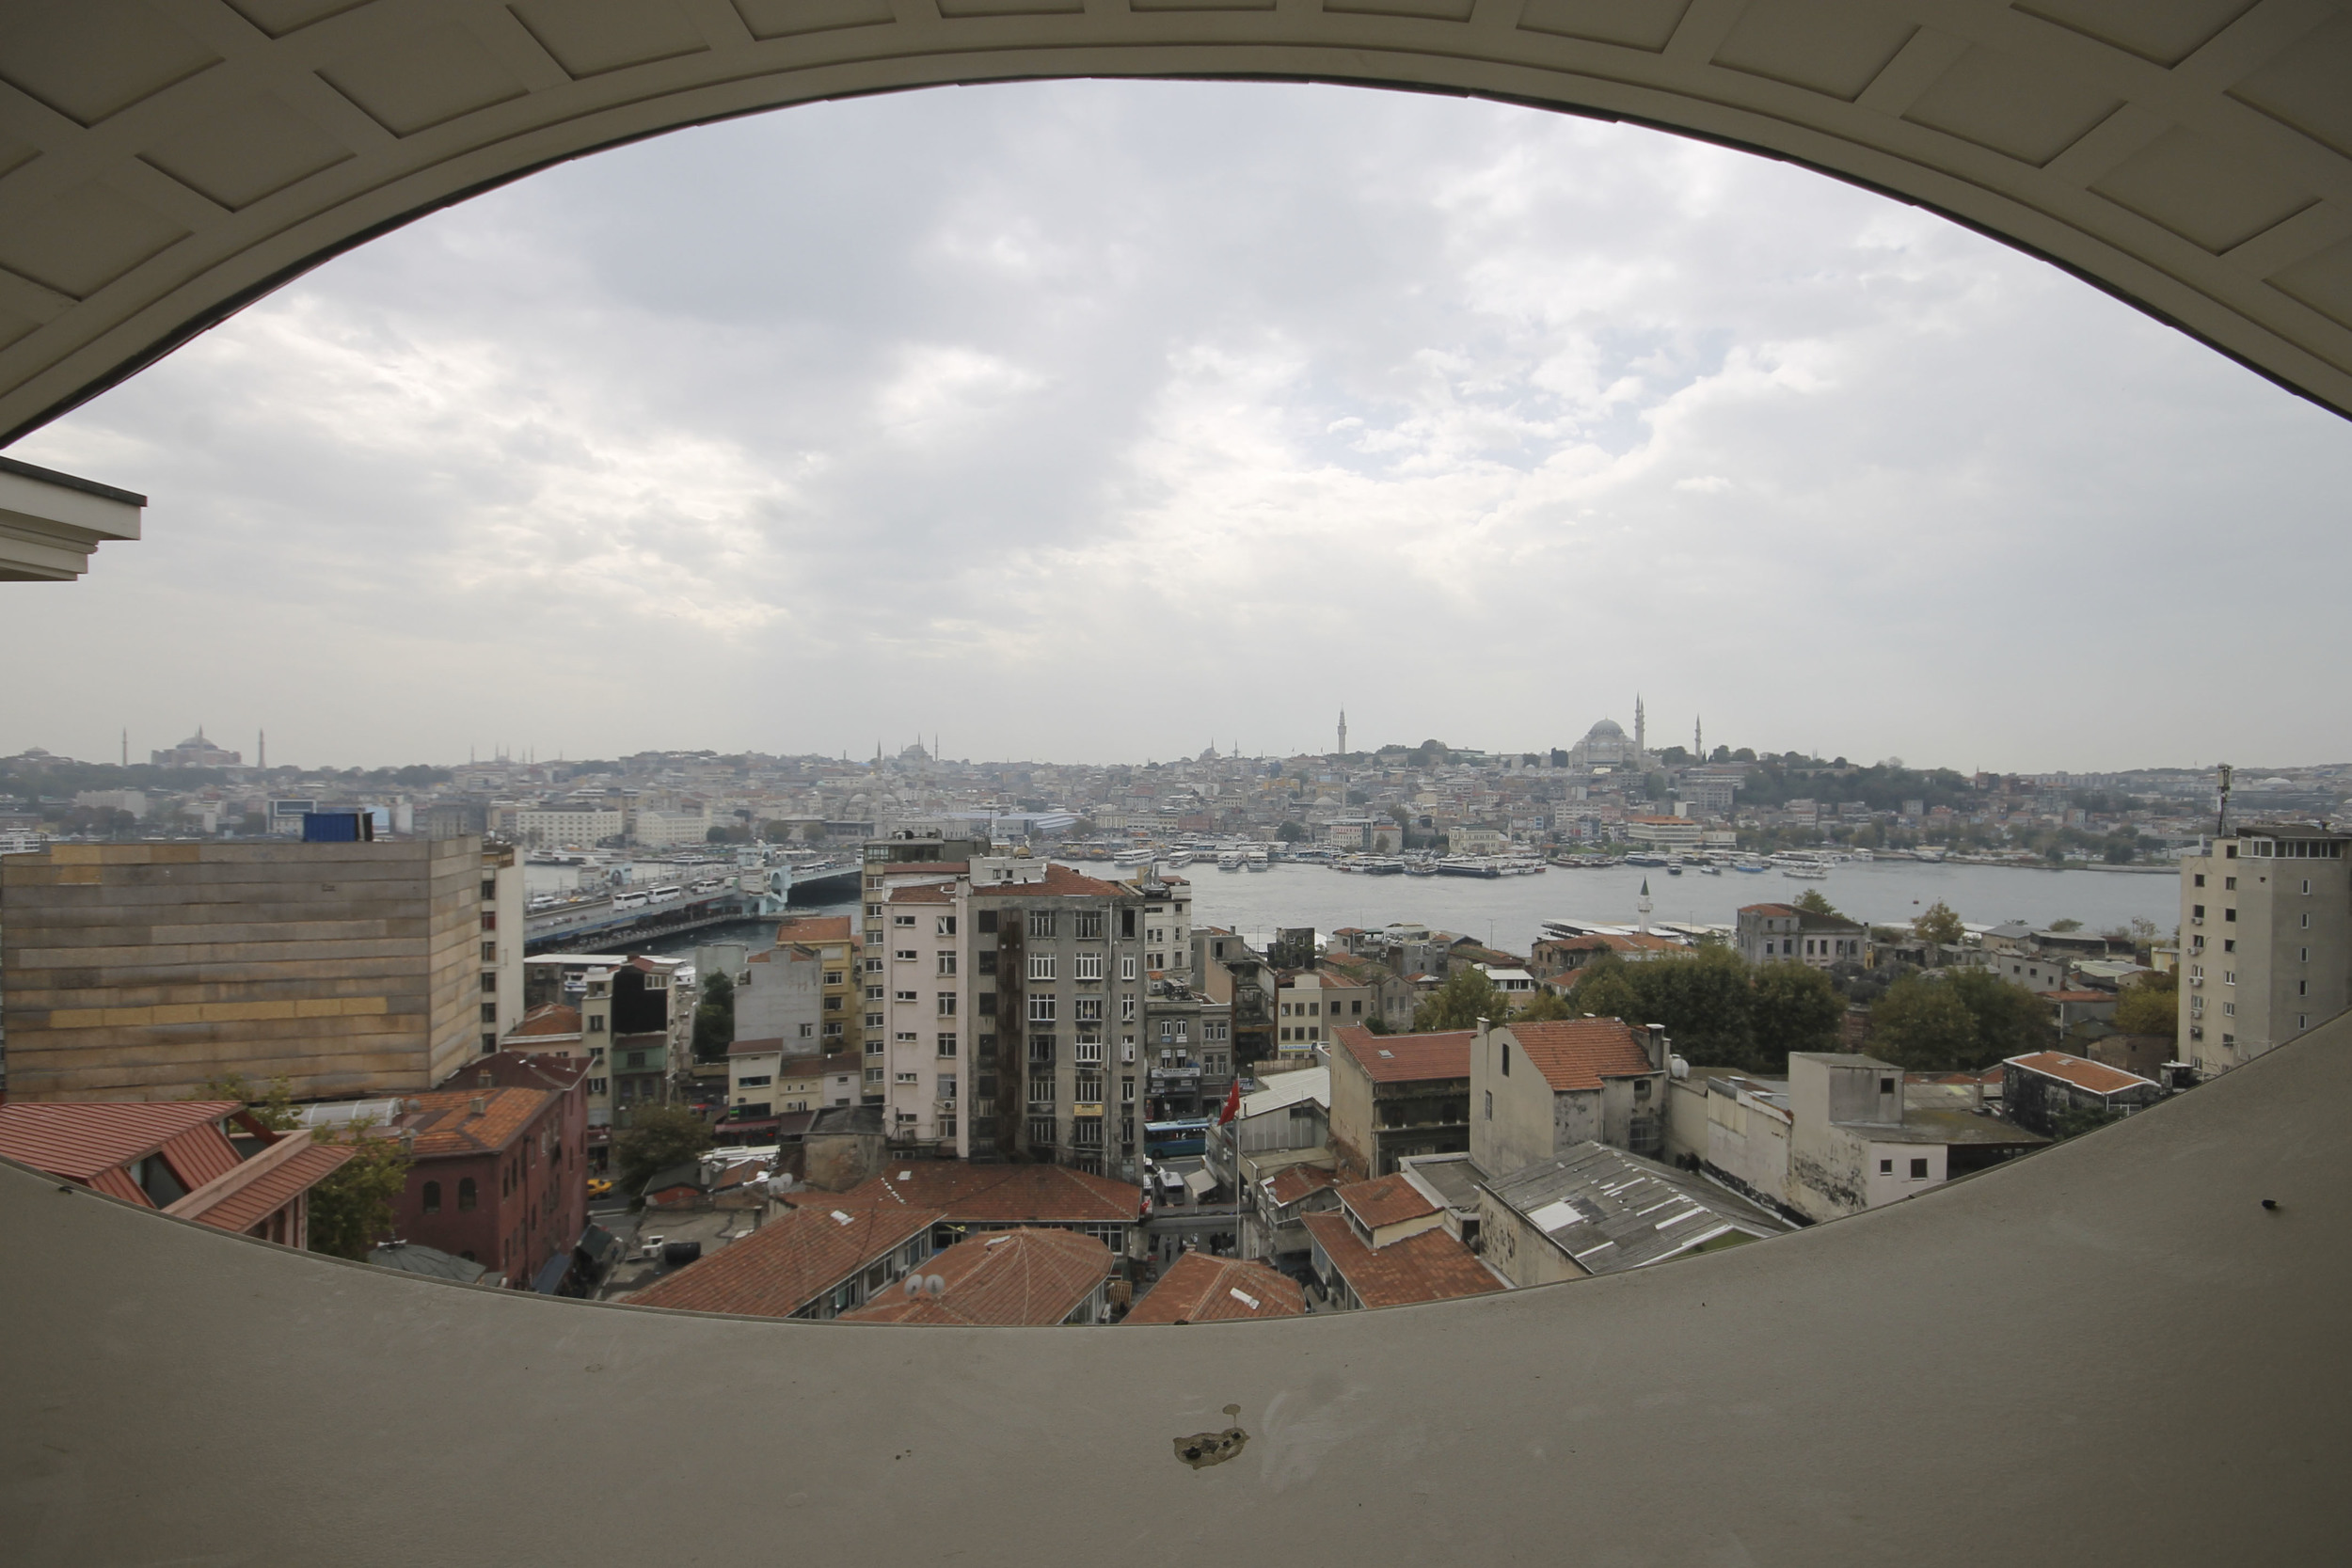 Istanbul, ygatonic on tour, Turkey yoga in istanbul2224.jpg